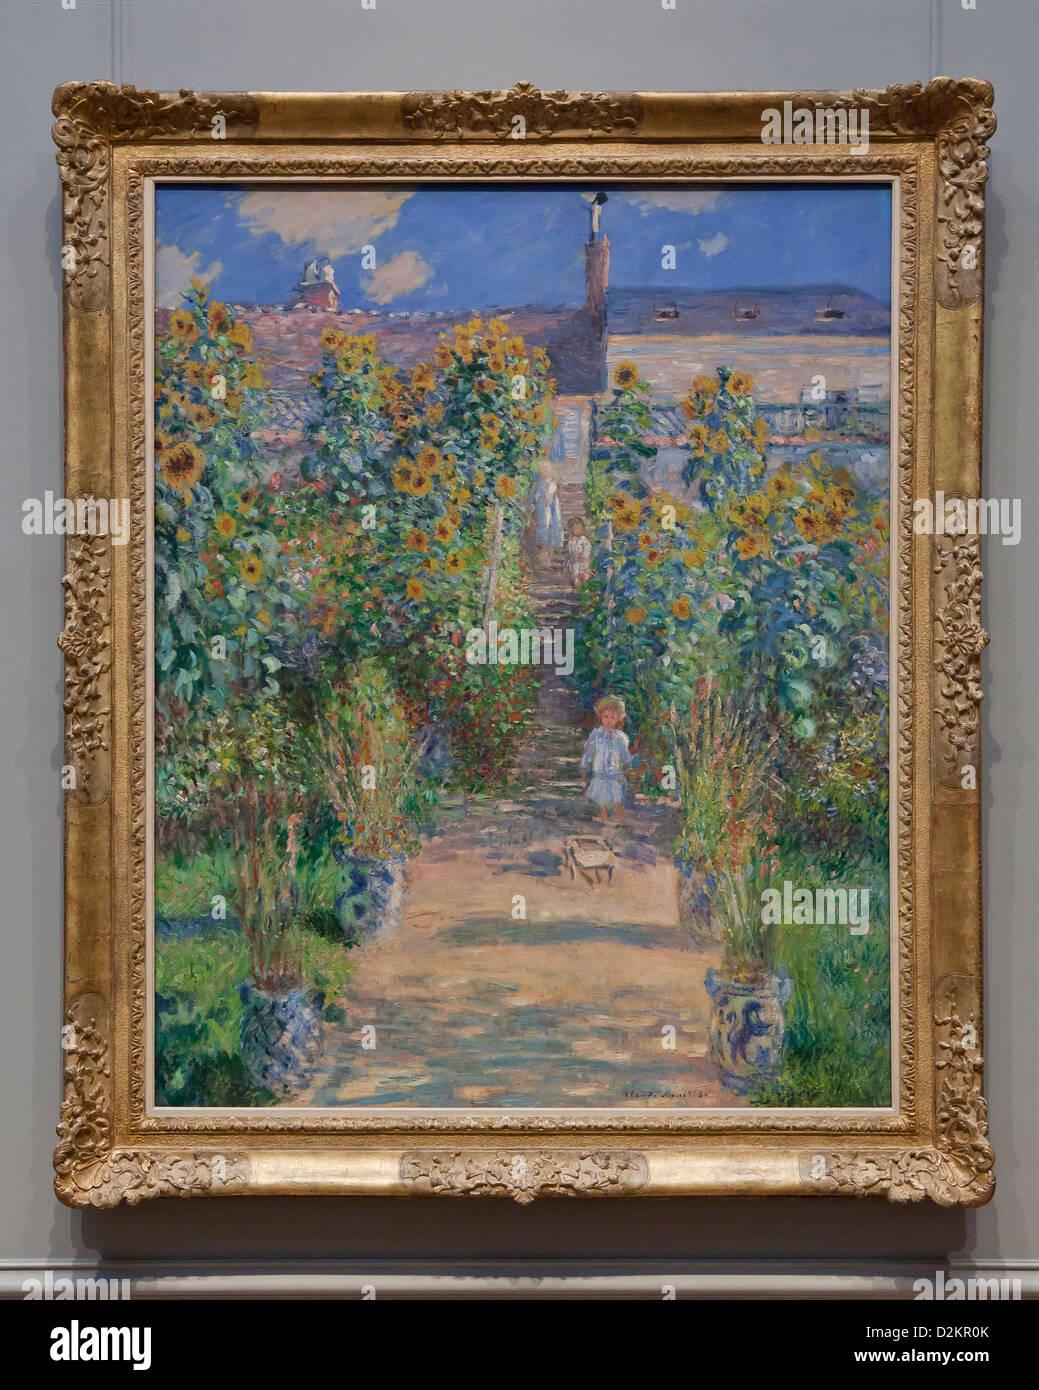 Artwork Appraisal